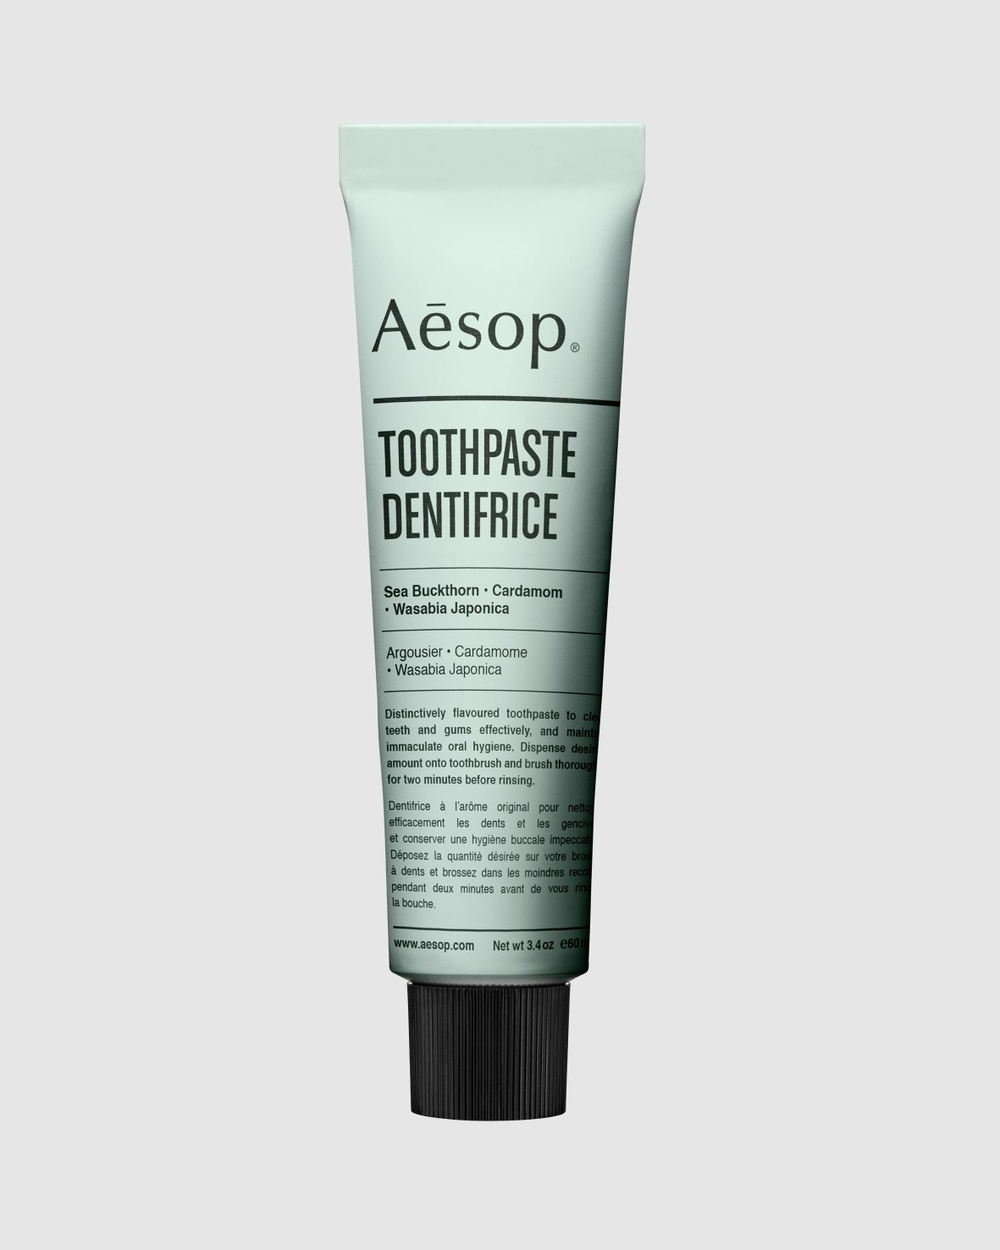 Aesop Toothpaste 60mL Beauty N/A